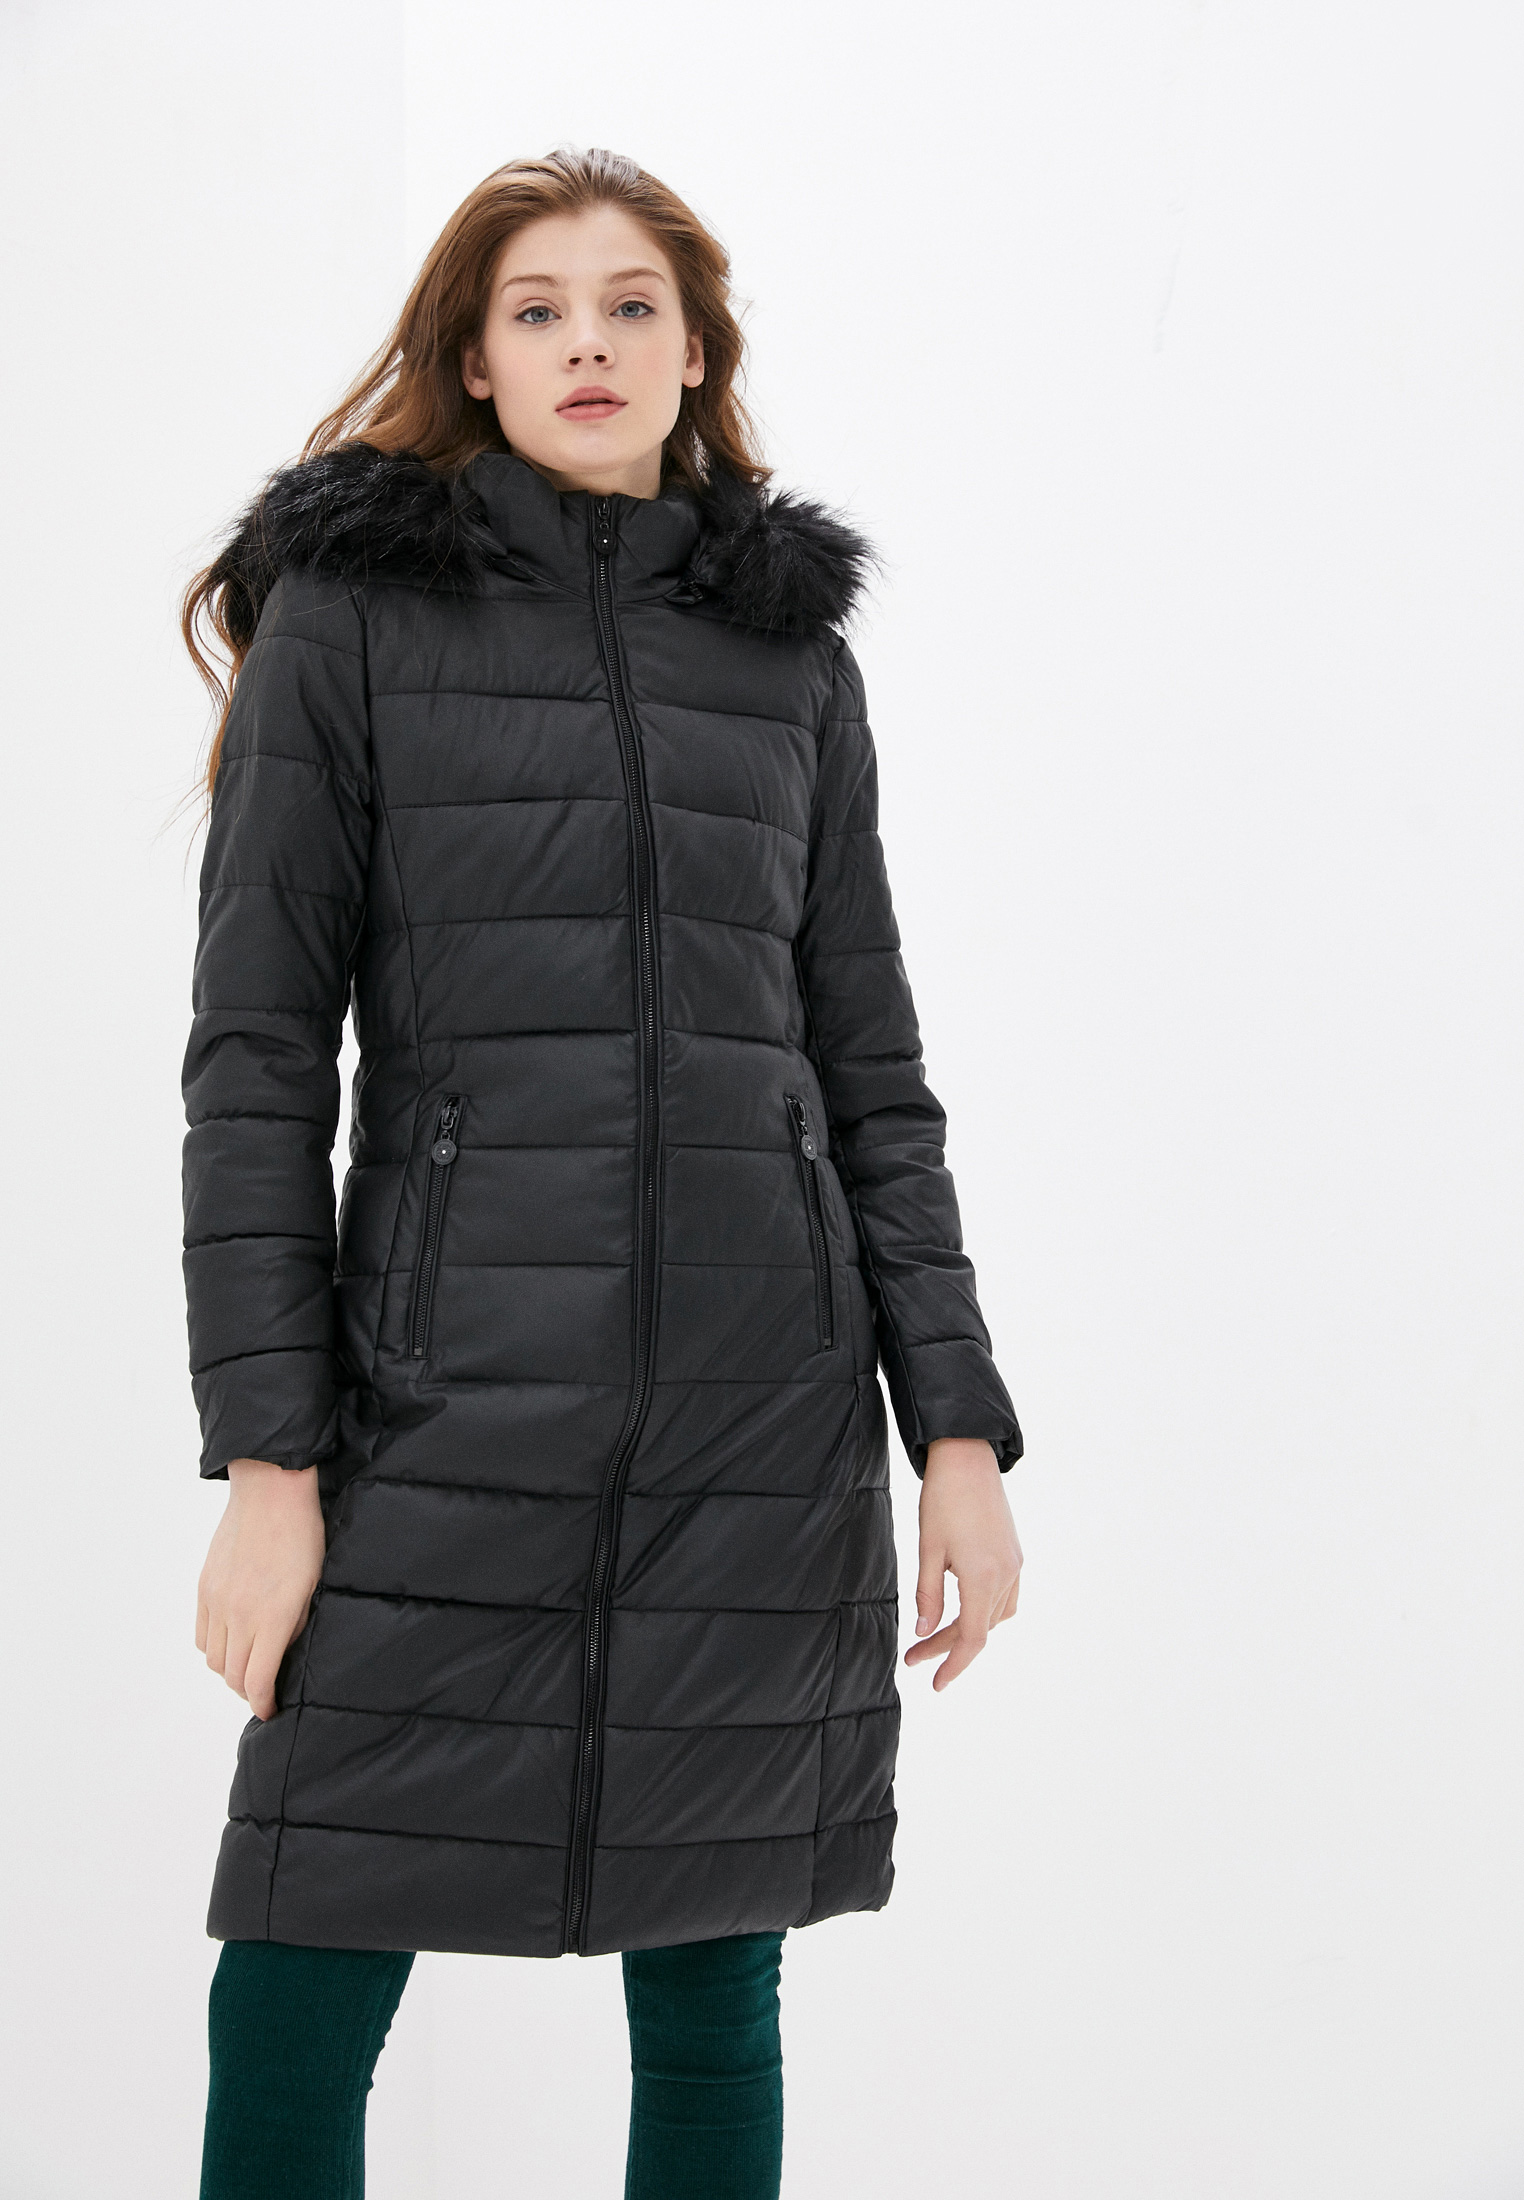 Утепленная куртка Zabaione WG-401-0016